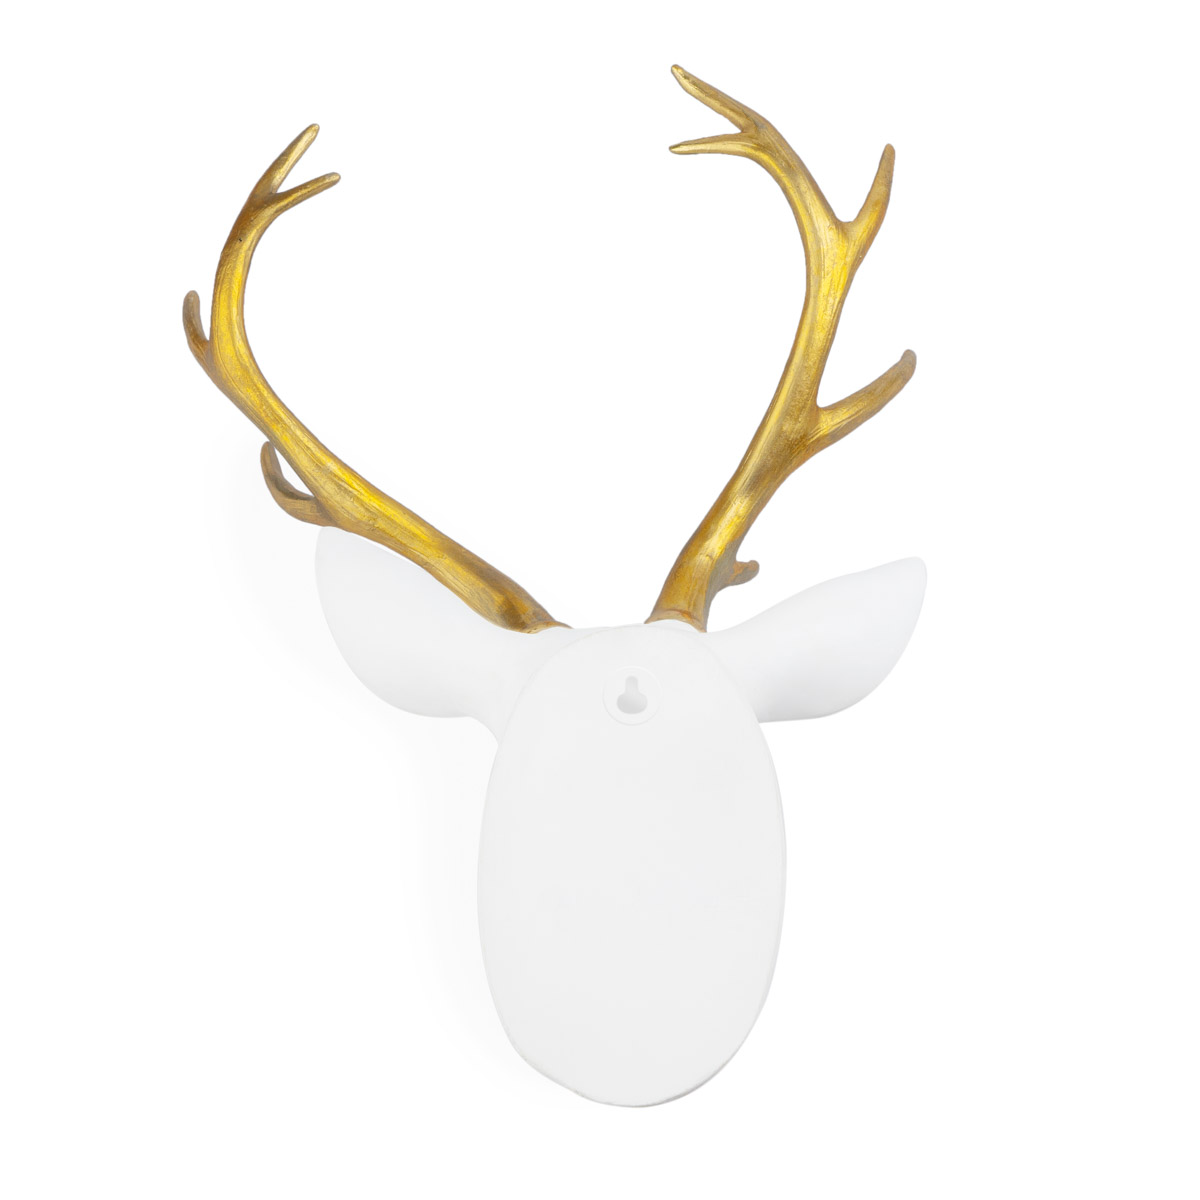 Cabeza Deer, poliresina, color blanco y dorado, figura decorativa,45x30x18 cm